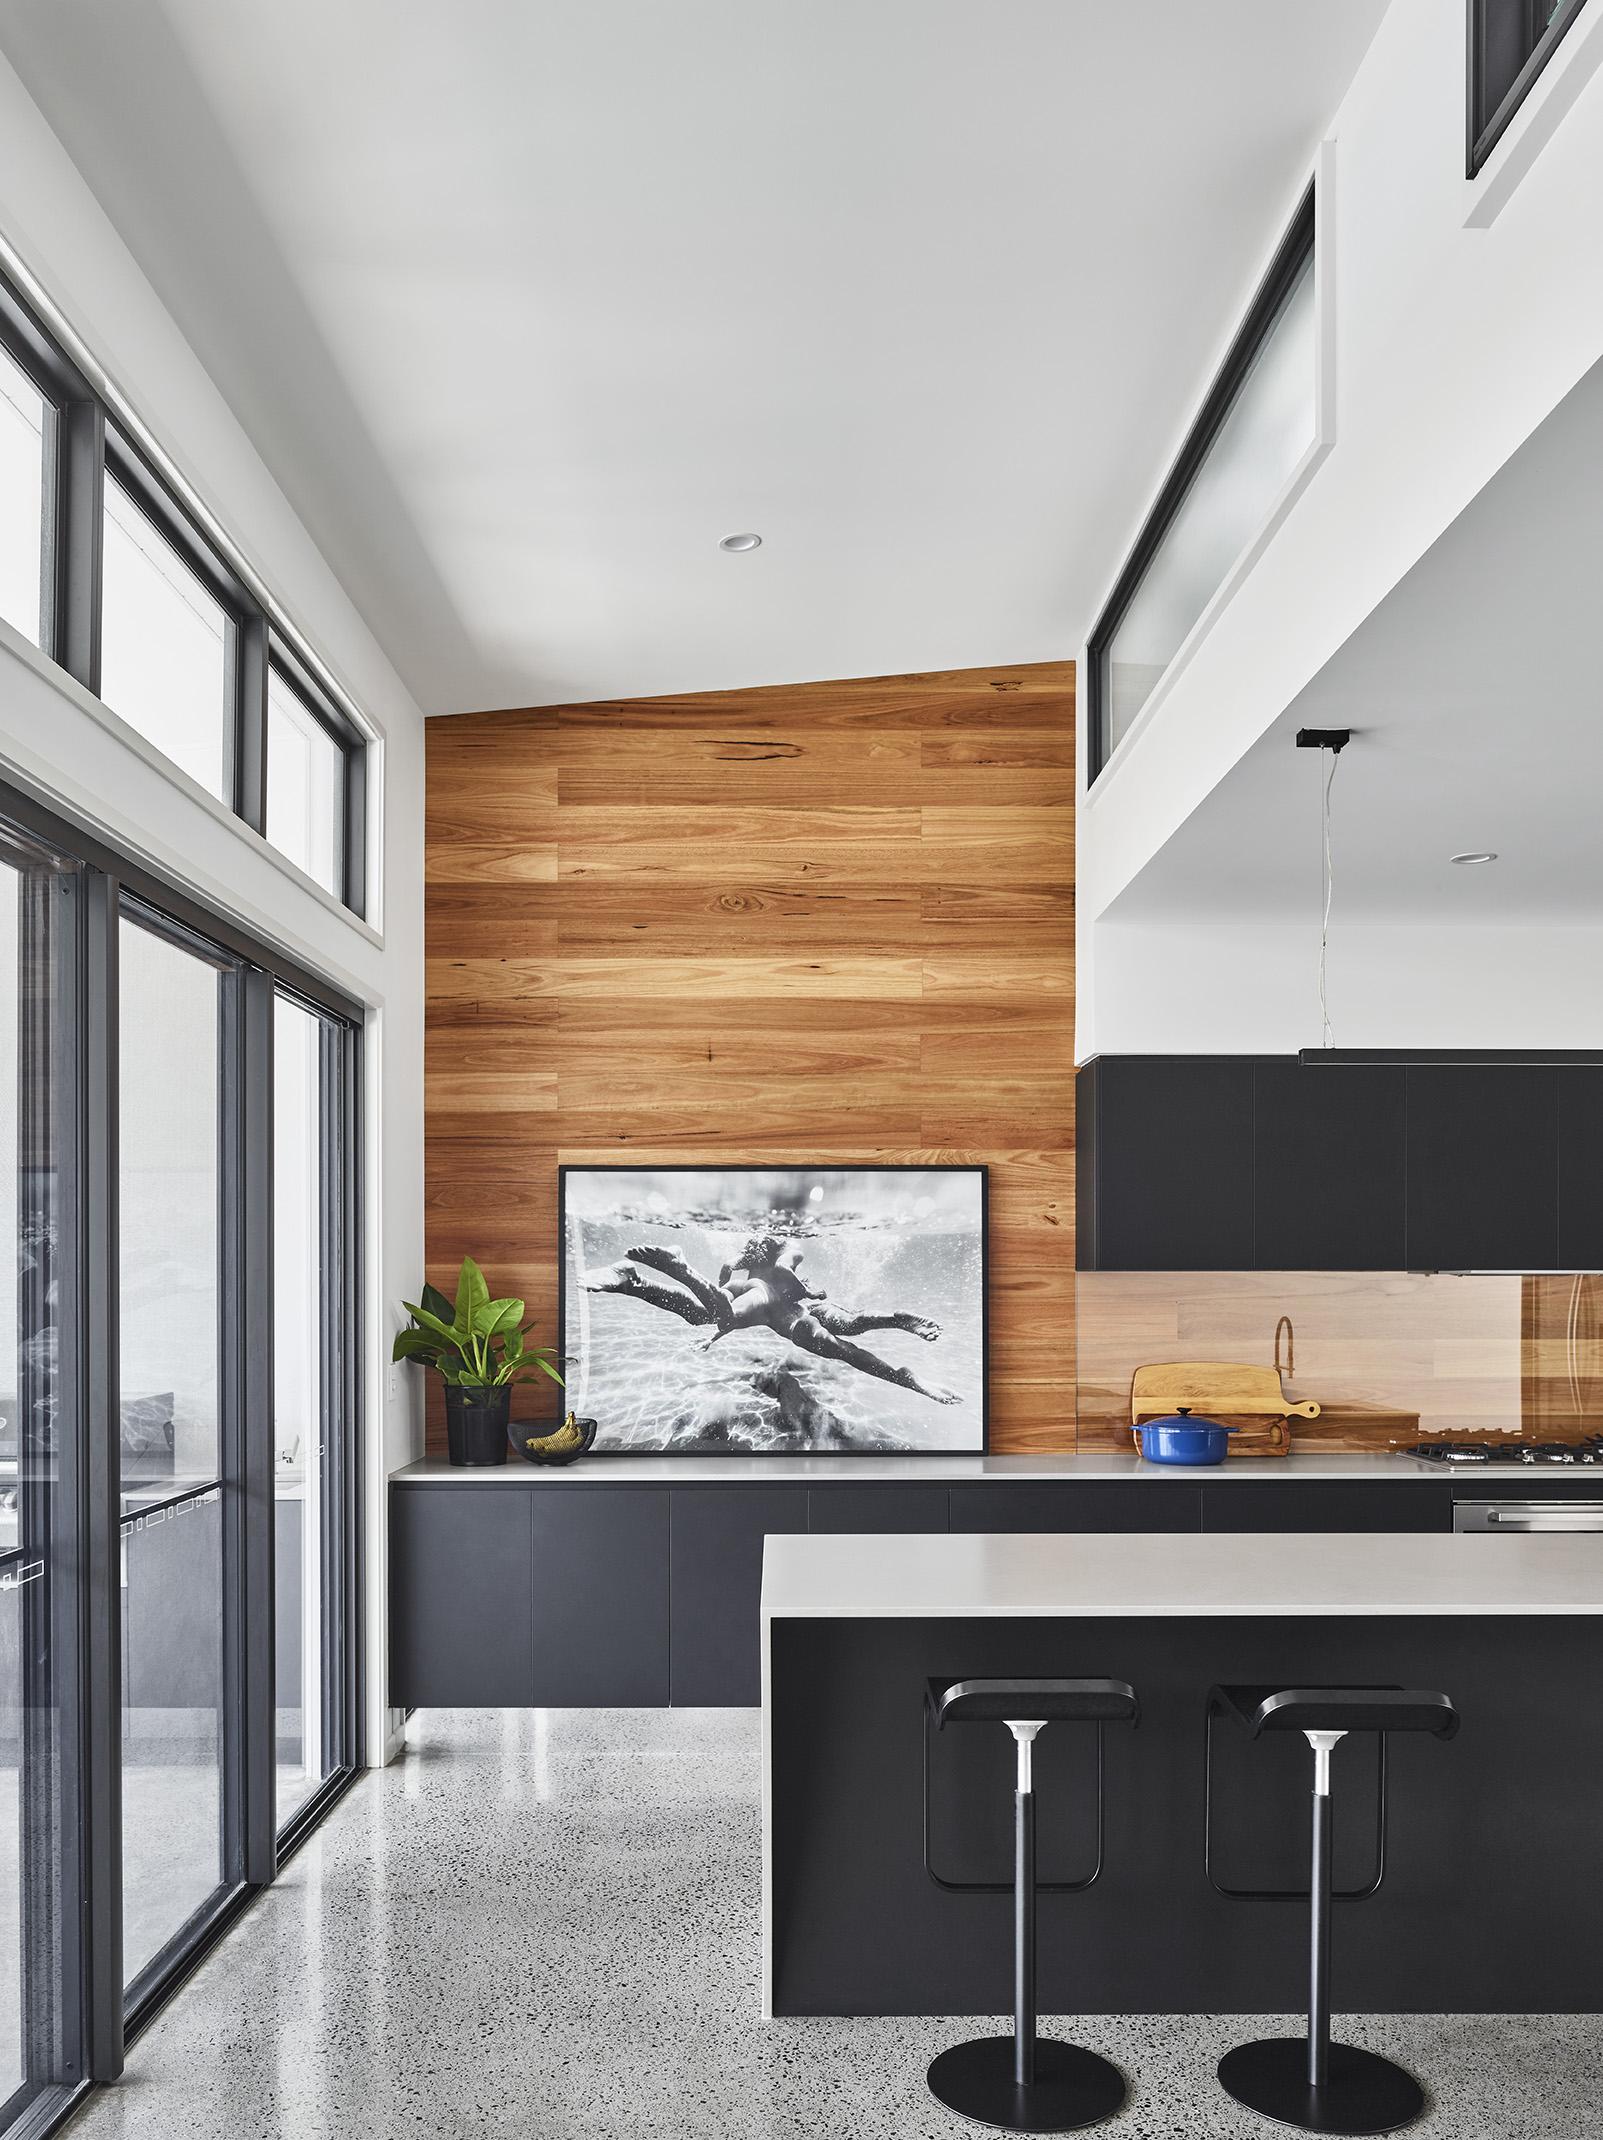 Langsford Cres House - Maytres Studios69280.jpg